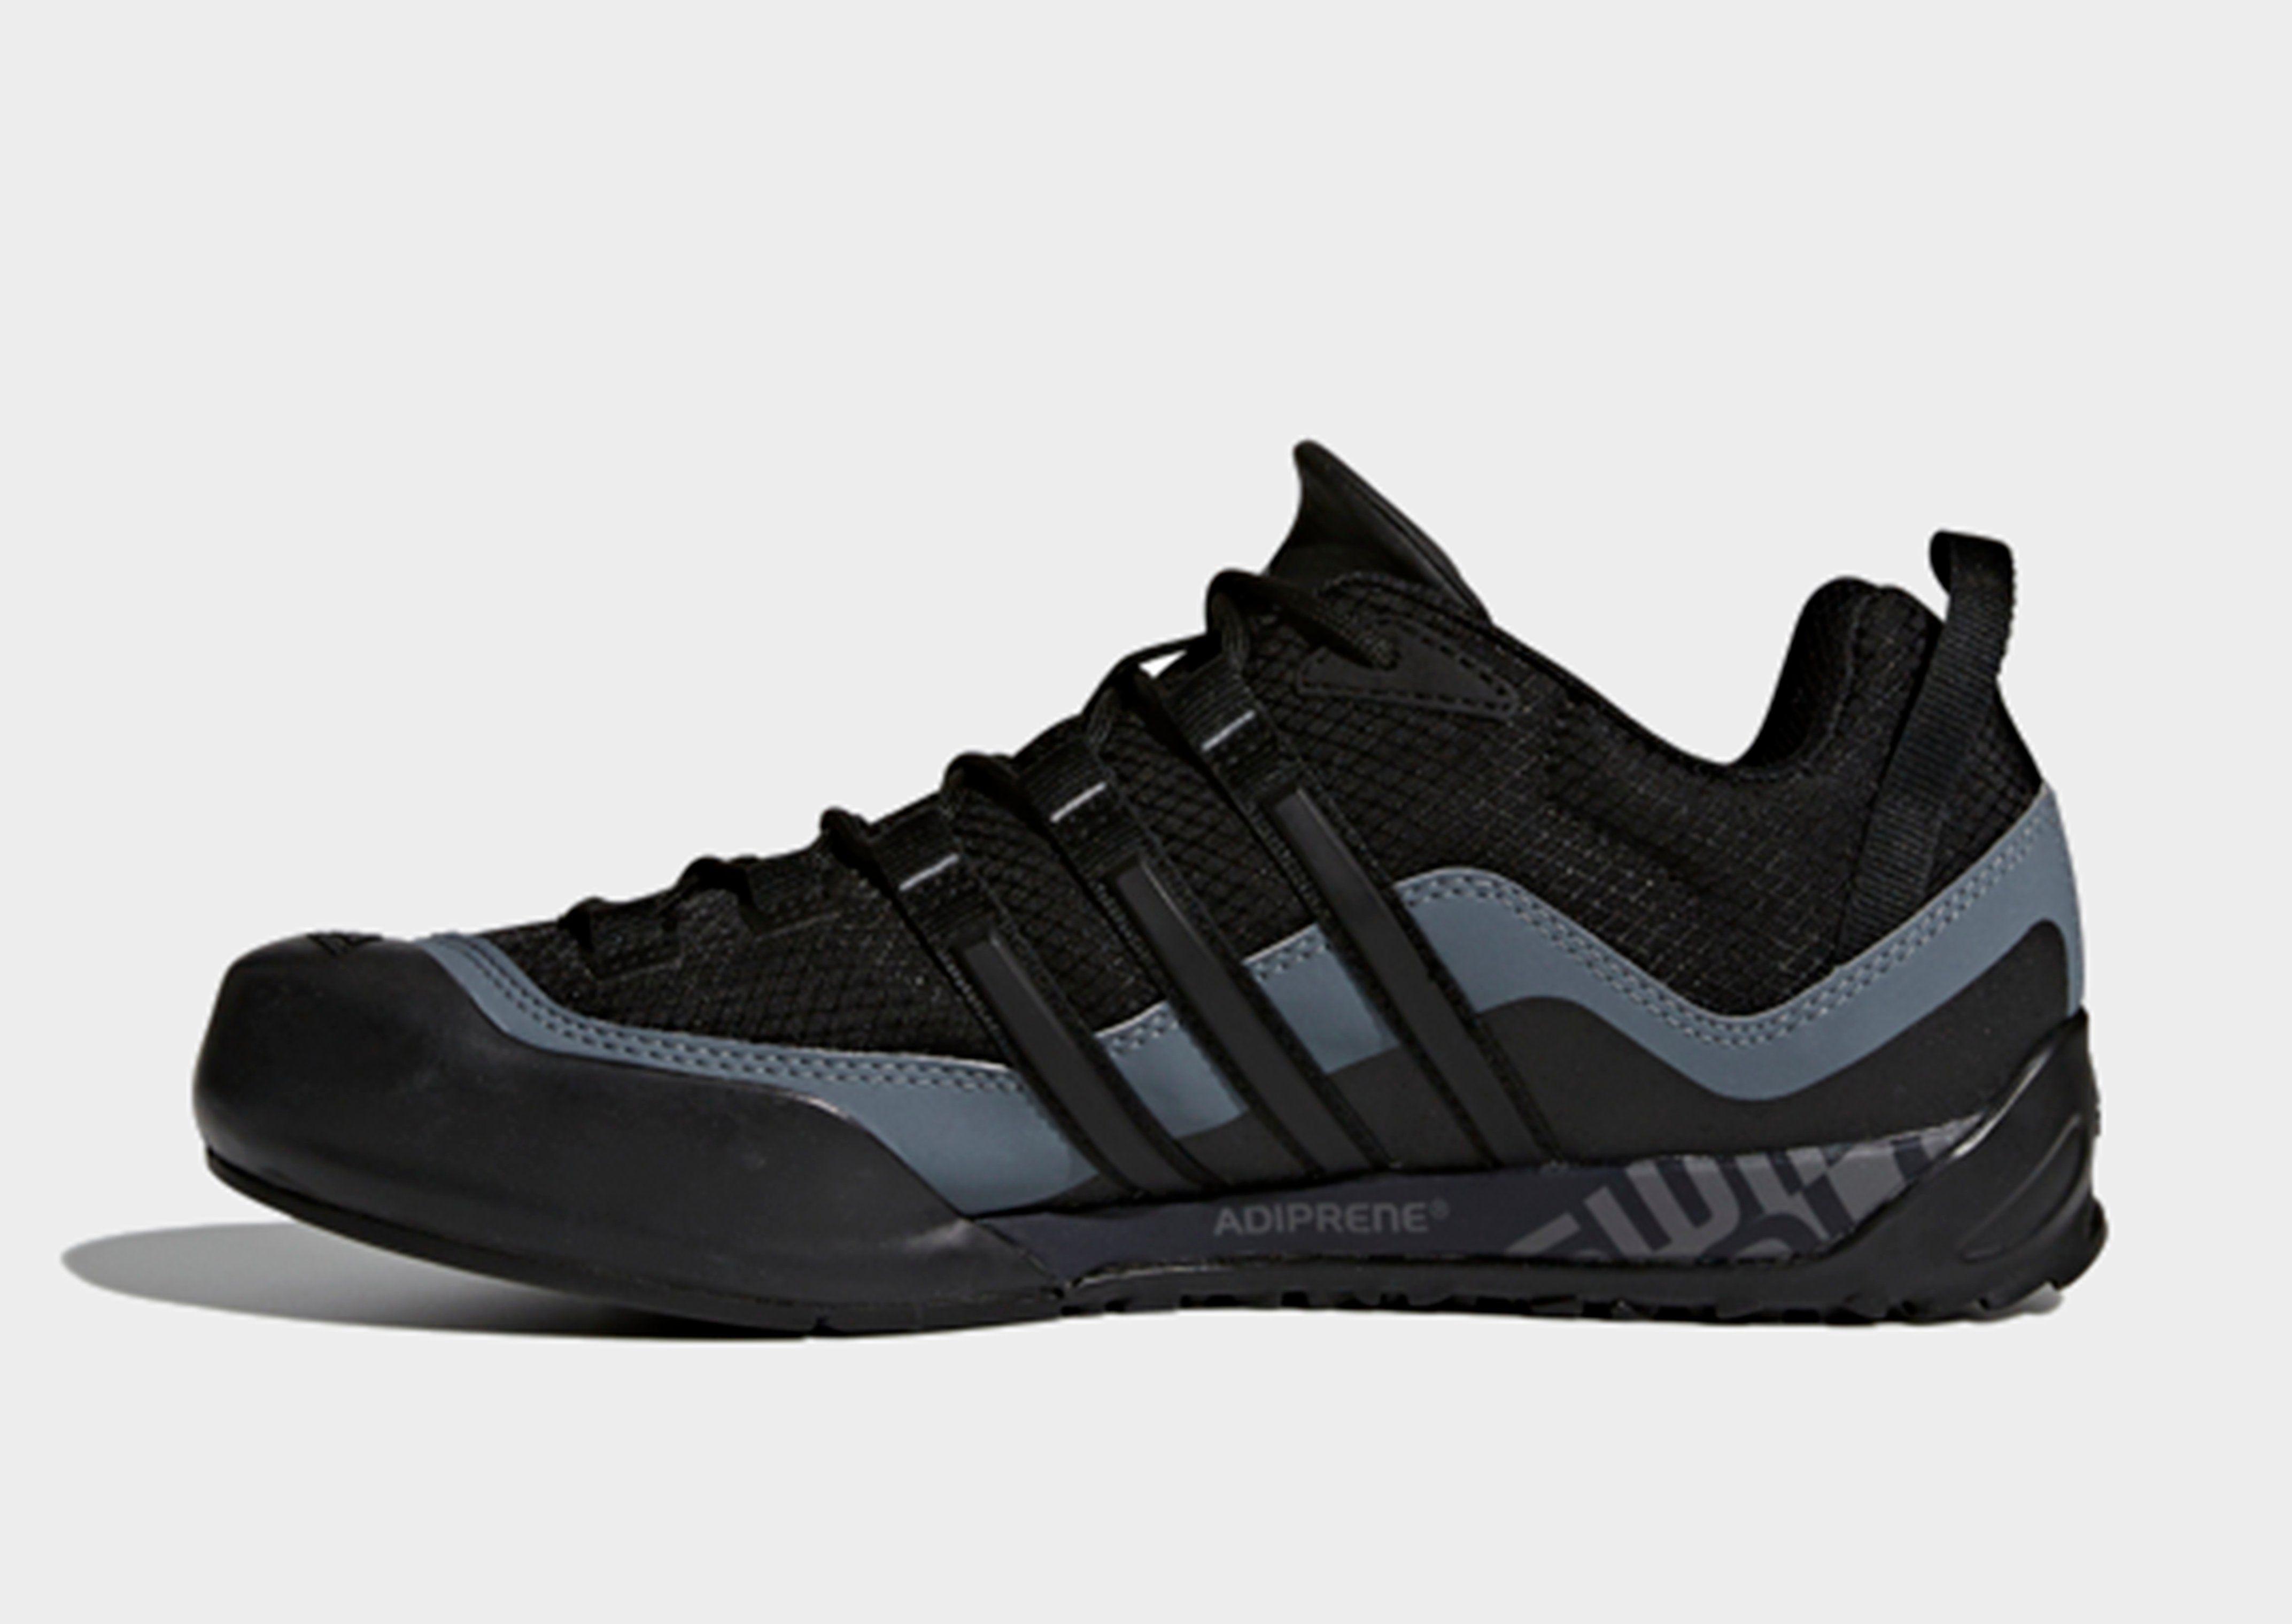 d16ab0c63 ADIDAS TERREX Swift Solo Shoes